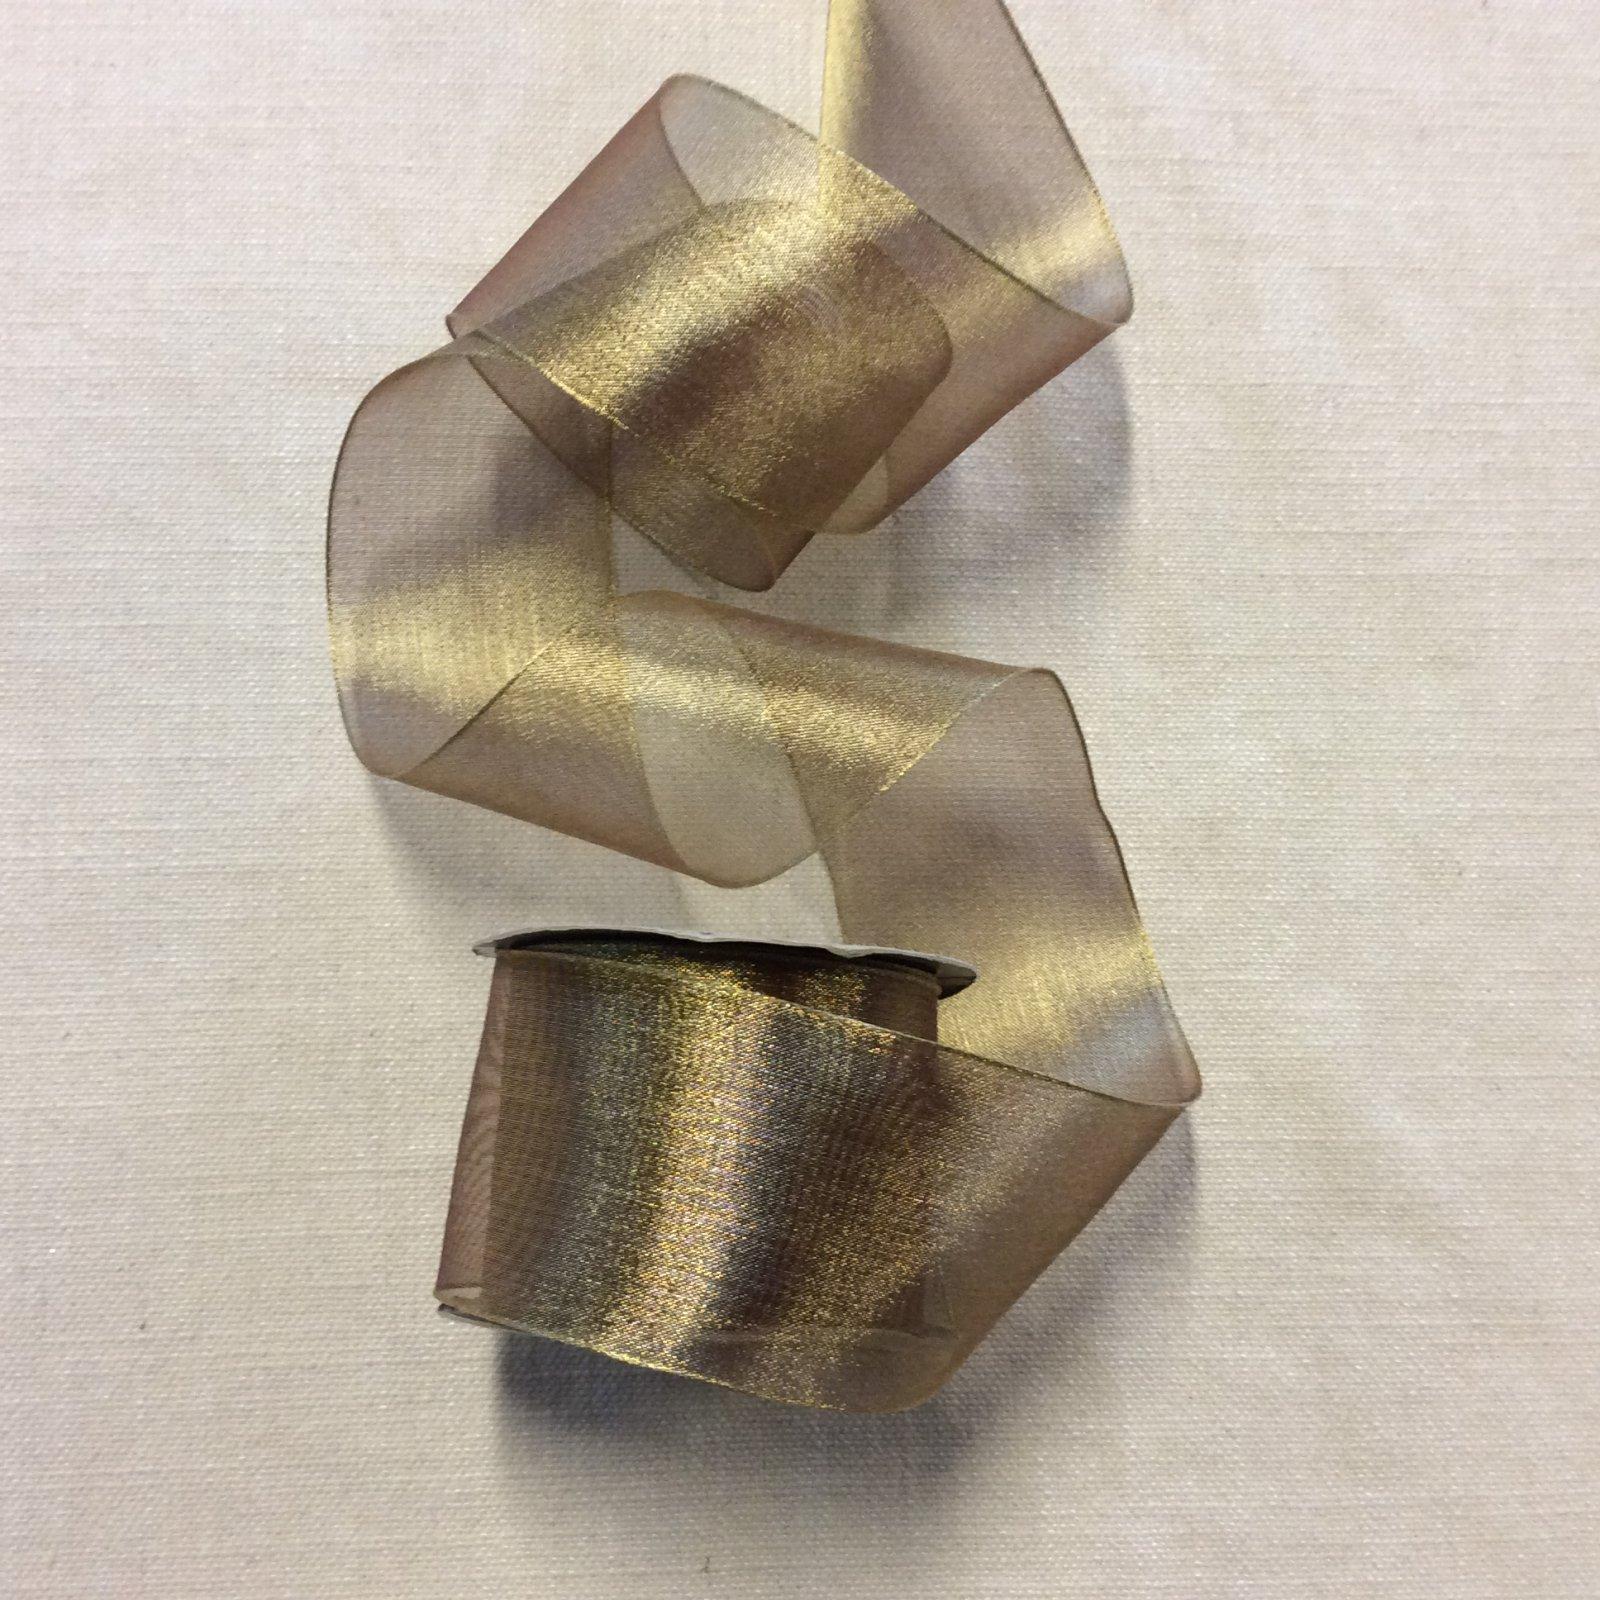 Organza Ribbon 2.5 Wired Gold Trim Ribbon RIB1226